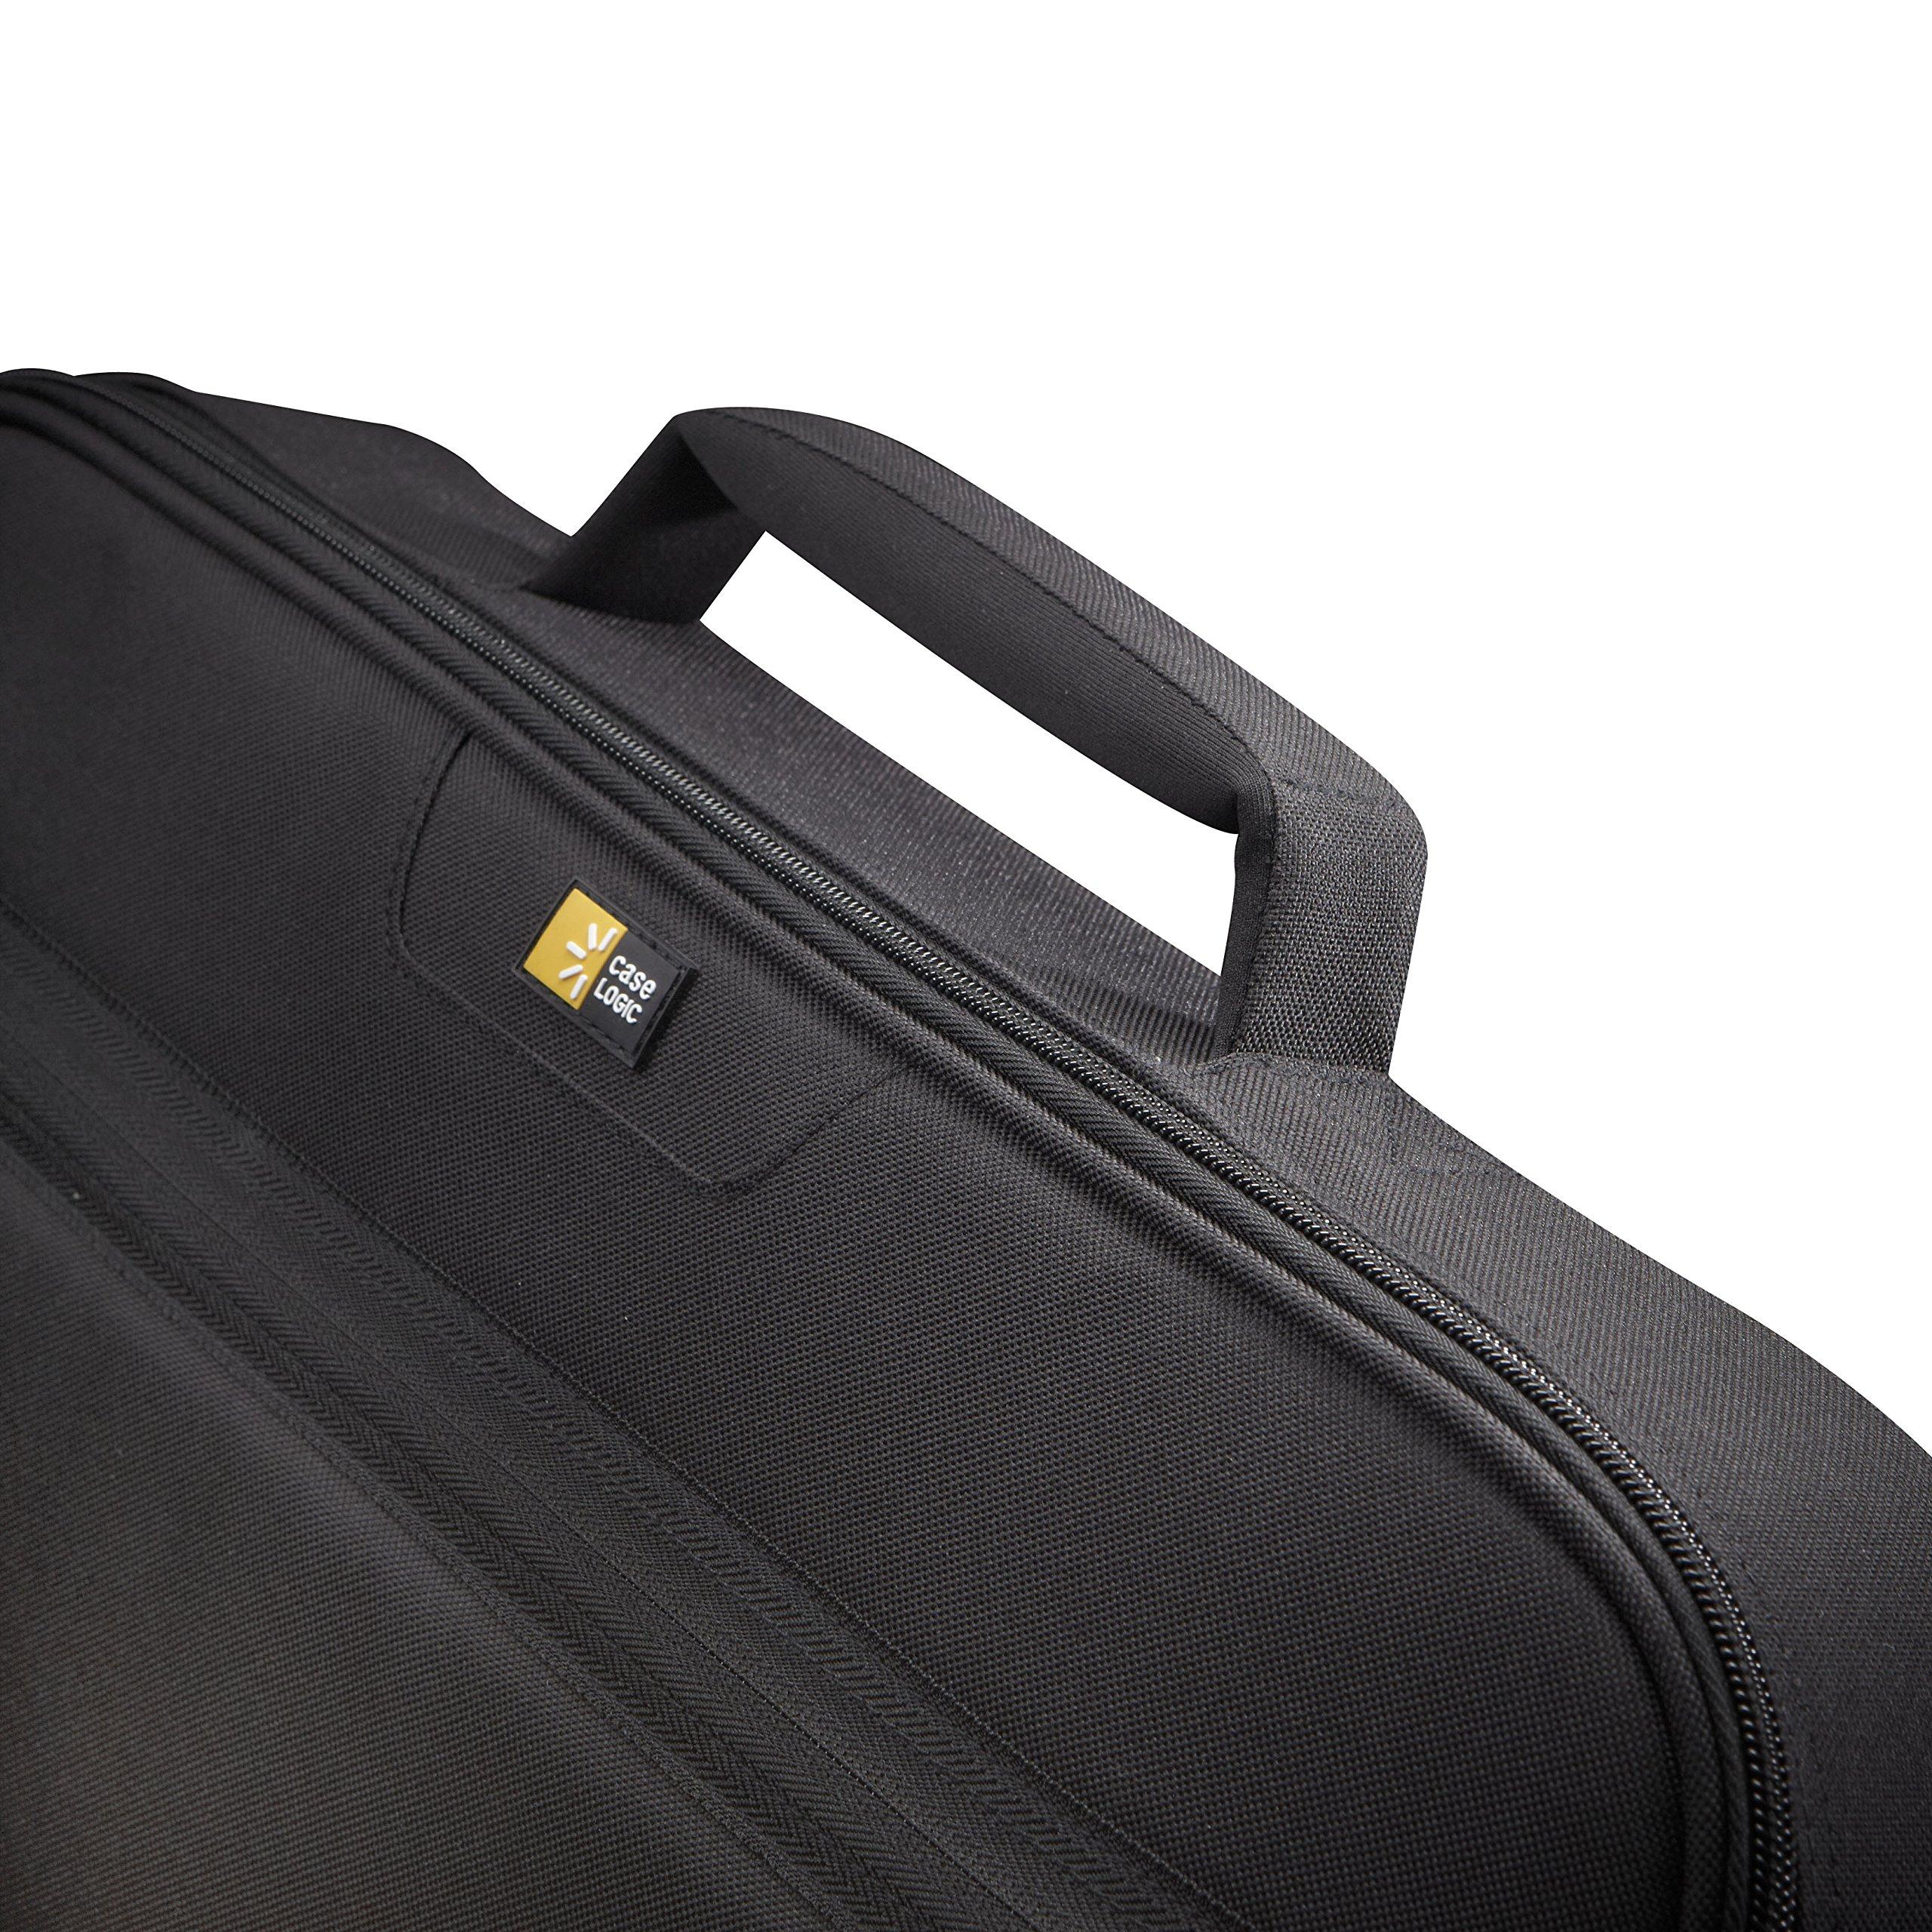 538a195f469 Case Logic 15.6-Inch Laptop Case (VNCI-215) - VNCI-215BLK   Bags ...